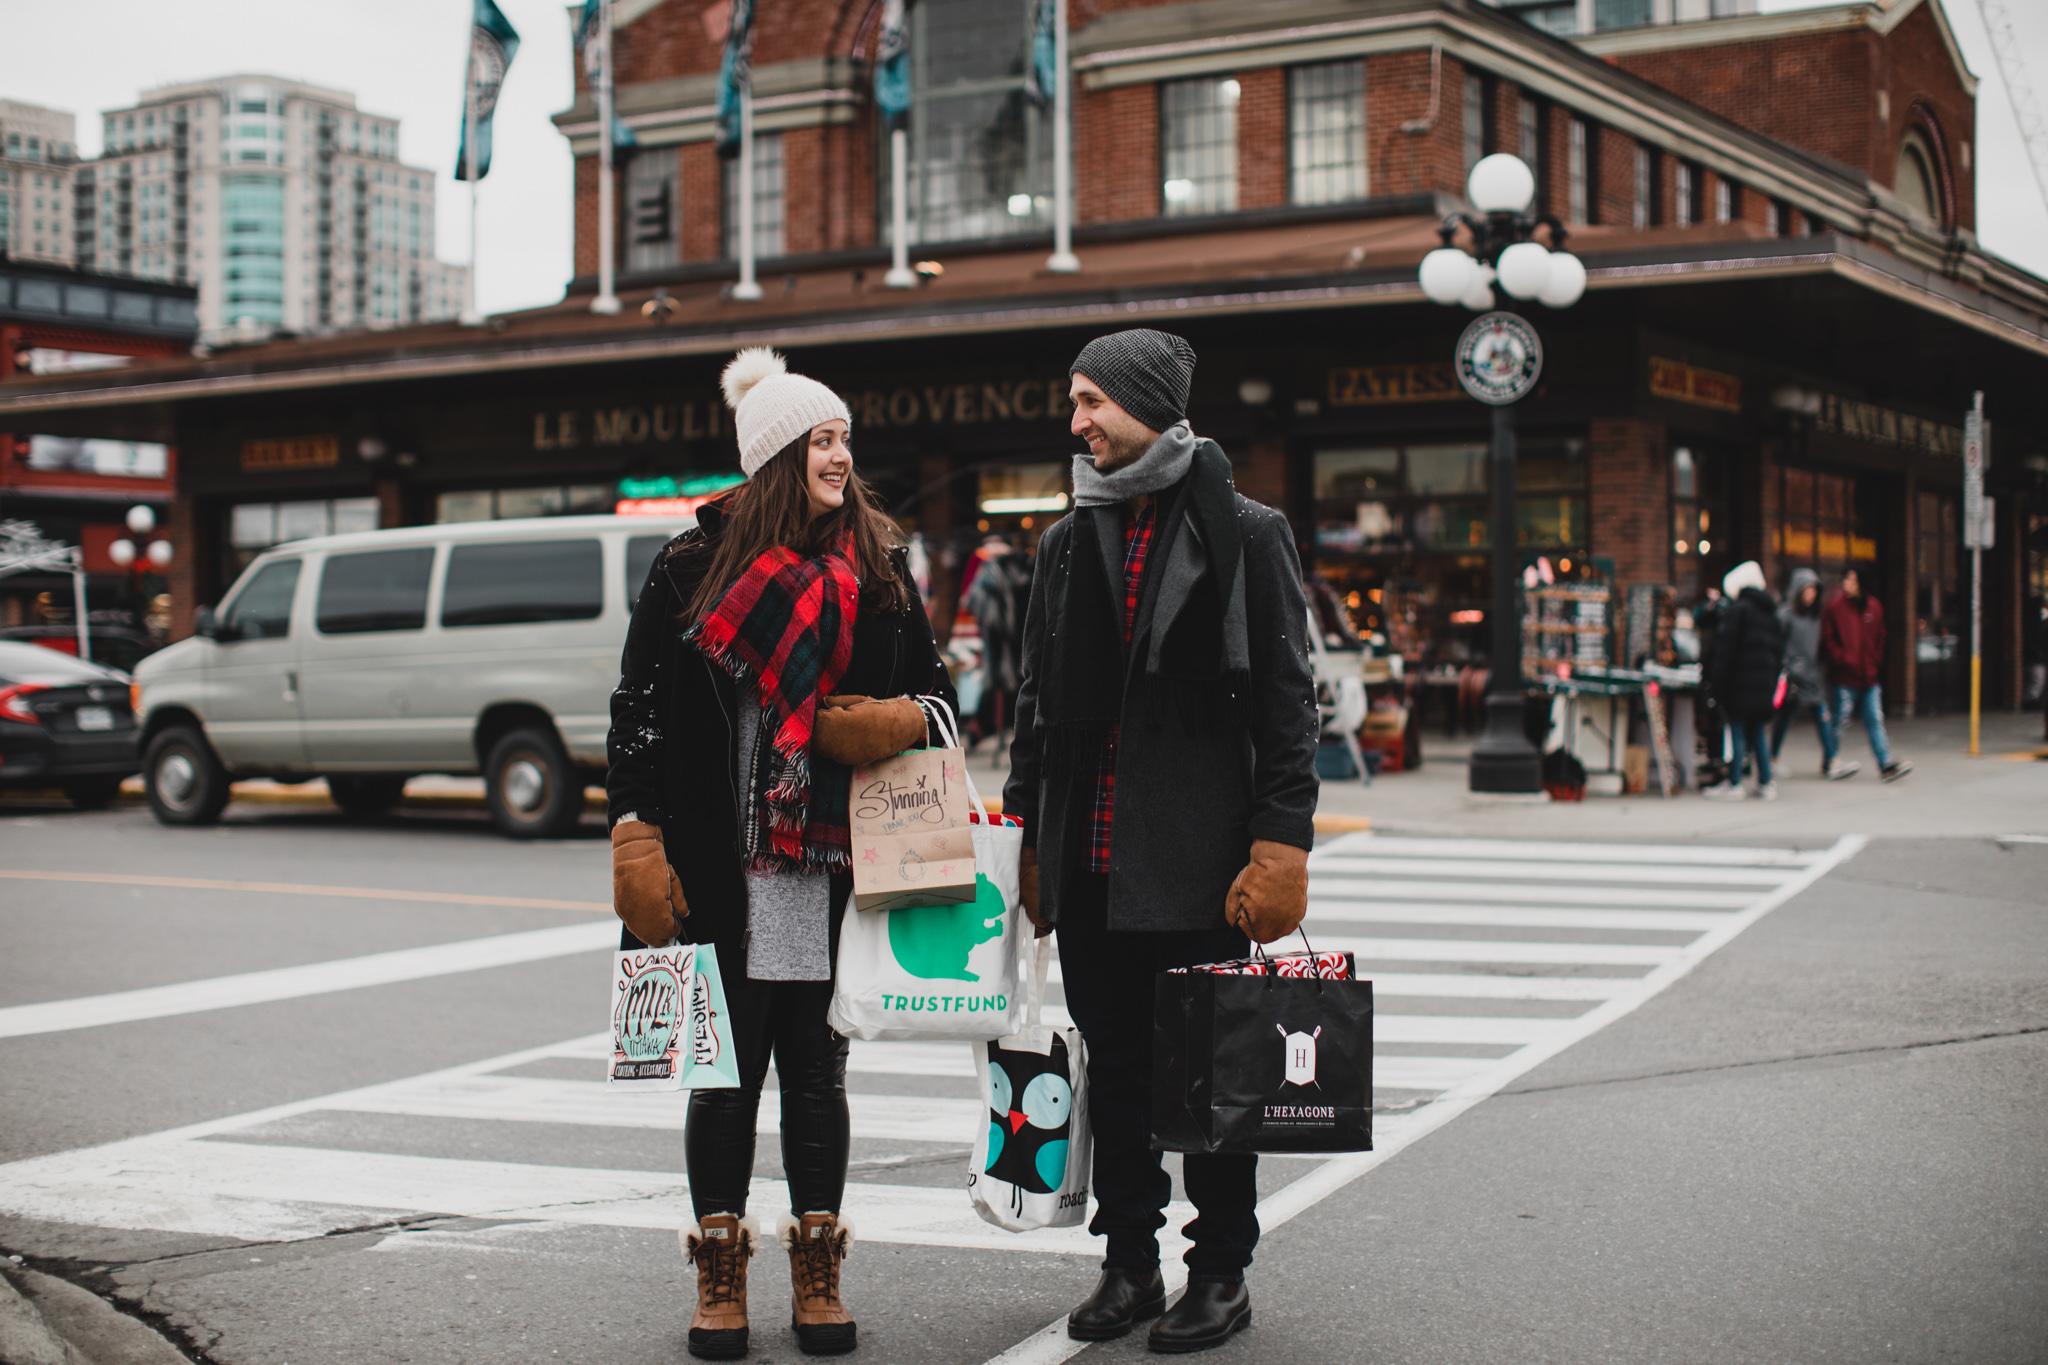 Byward market shopping